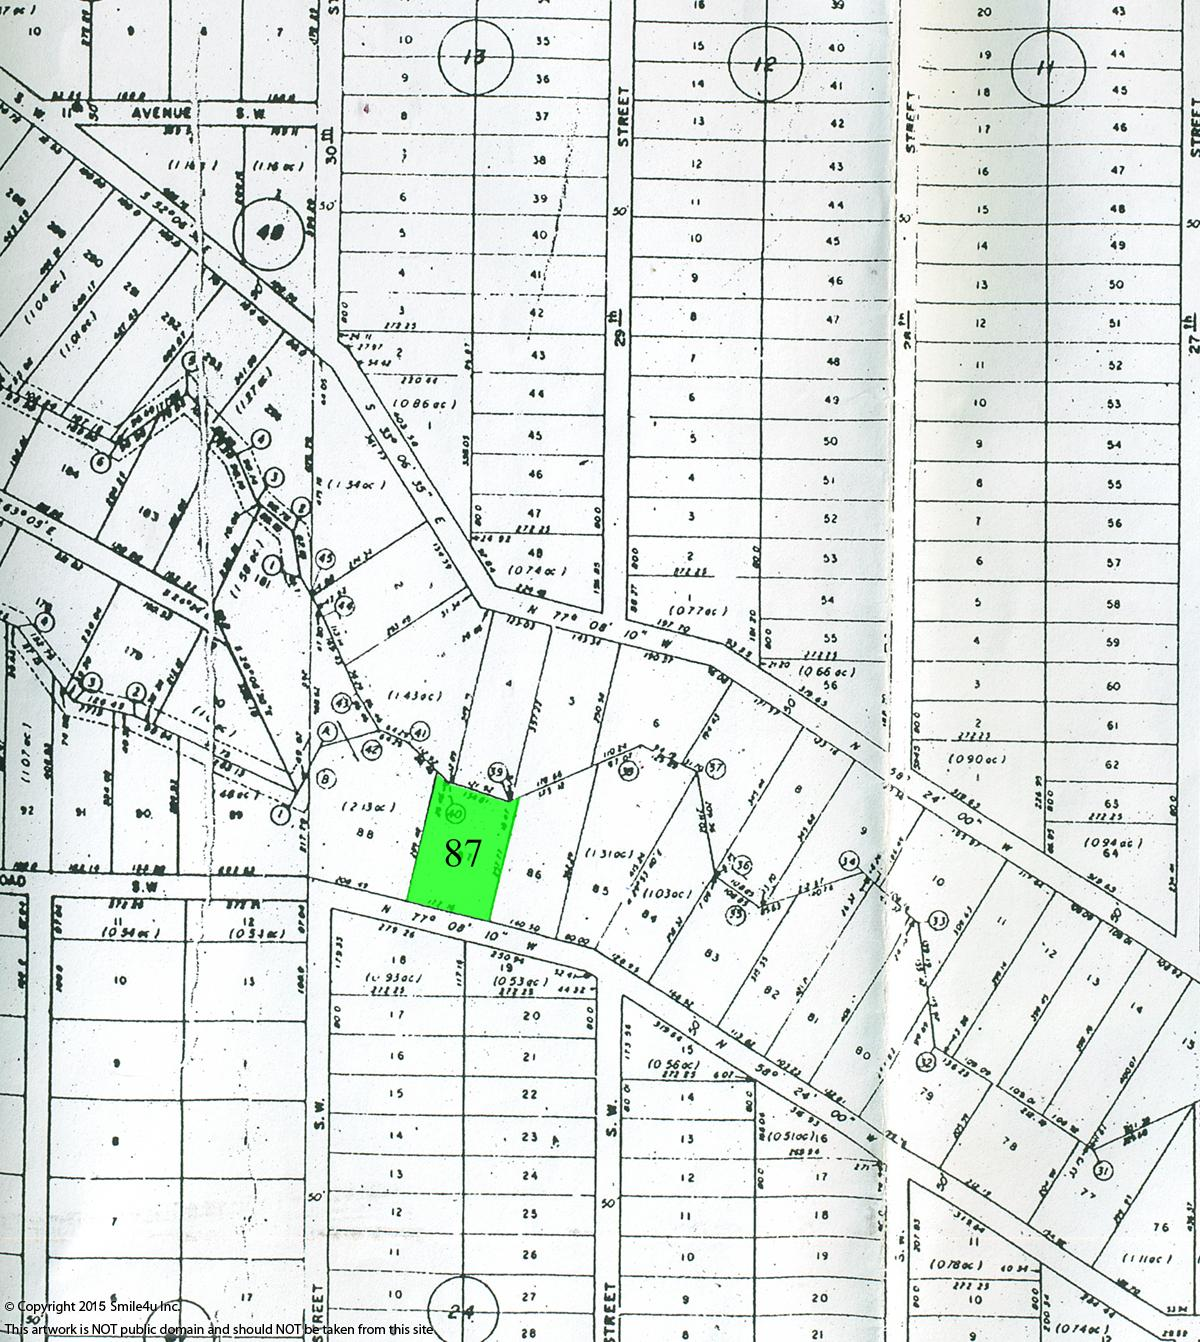 1 Acre Land In Rio Rancho Est Unit 4